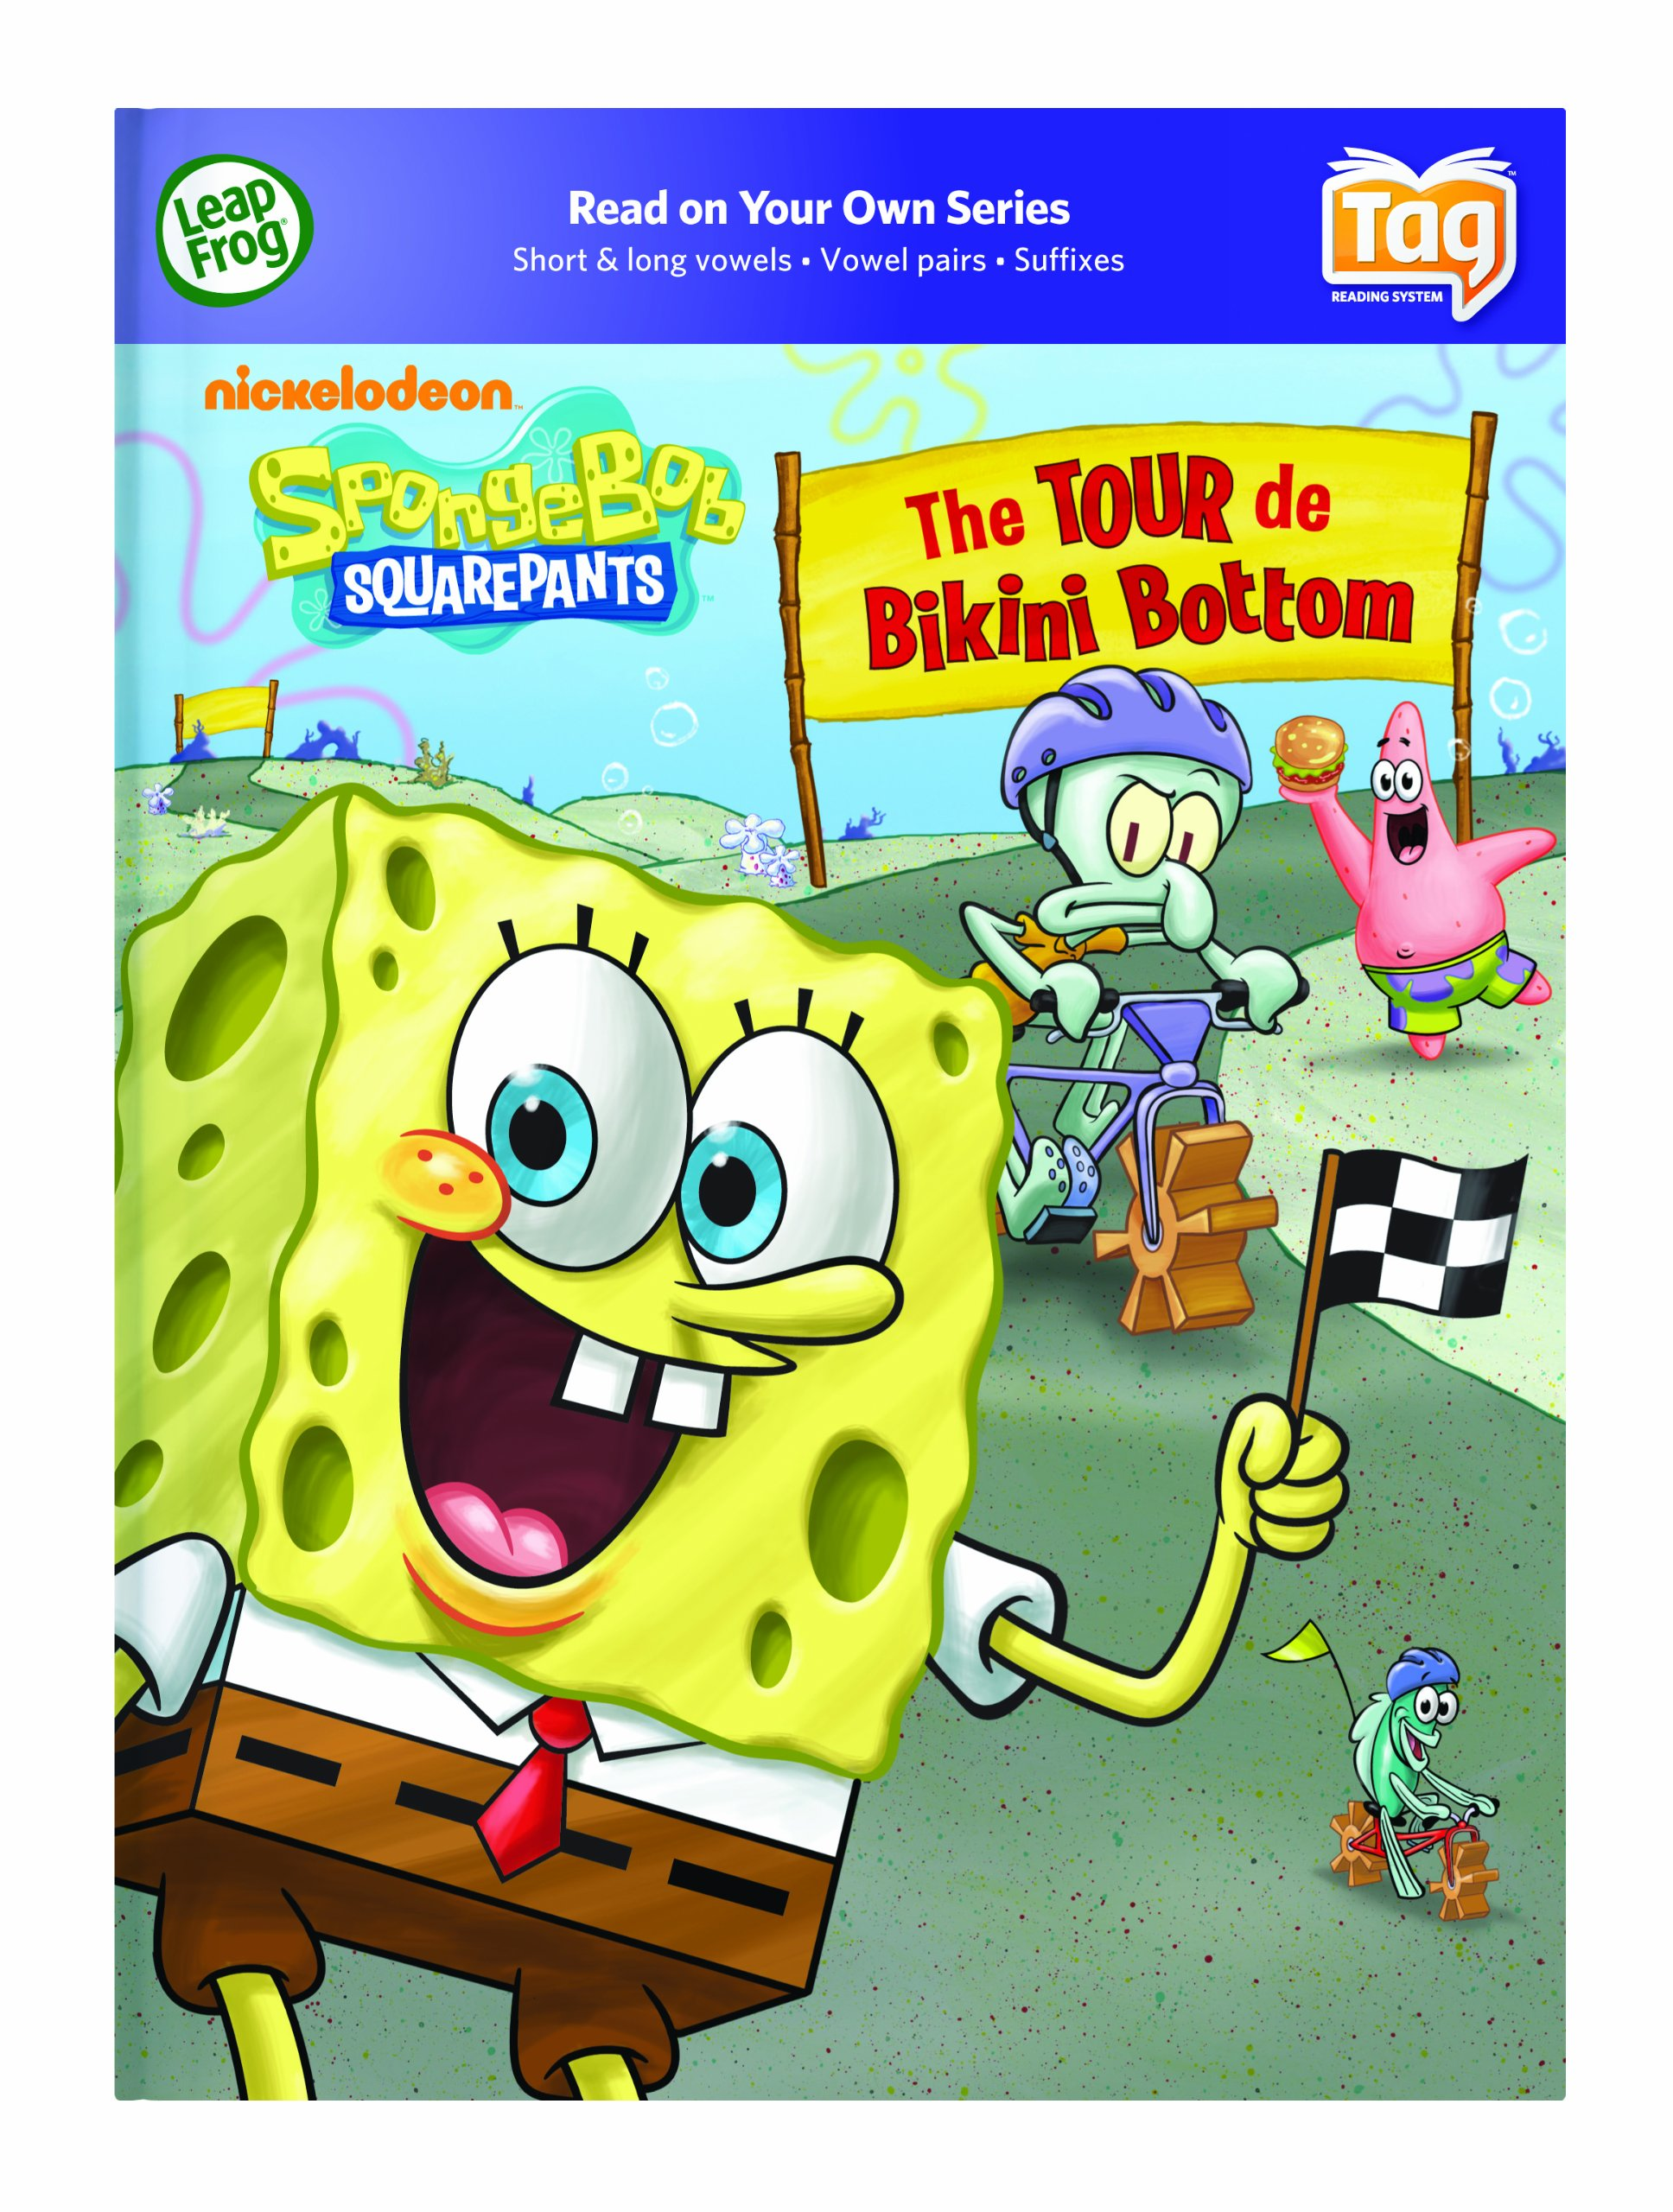 Leapfrog Tag Activity Storybook Spongebob Squarepants: The Tour De Bikini Bottom by LeapFrog (Image #4)